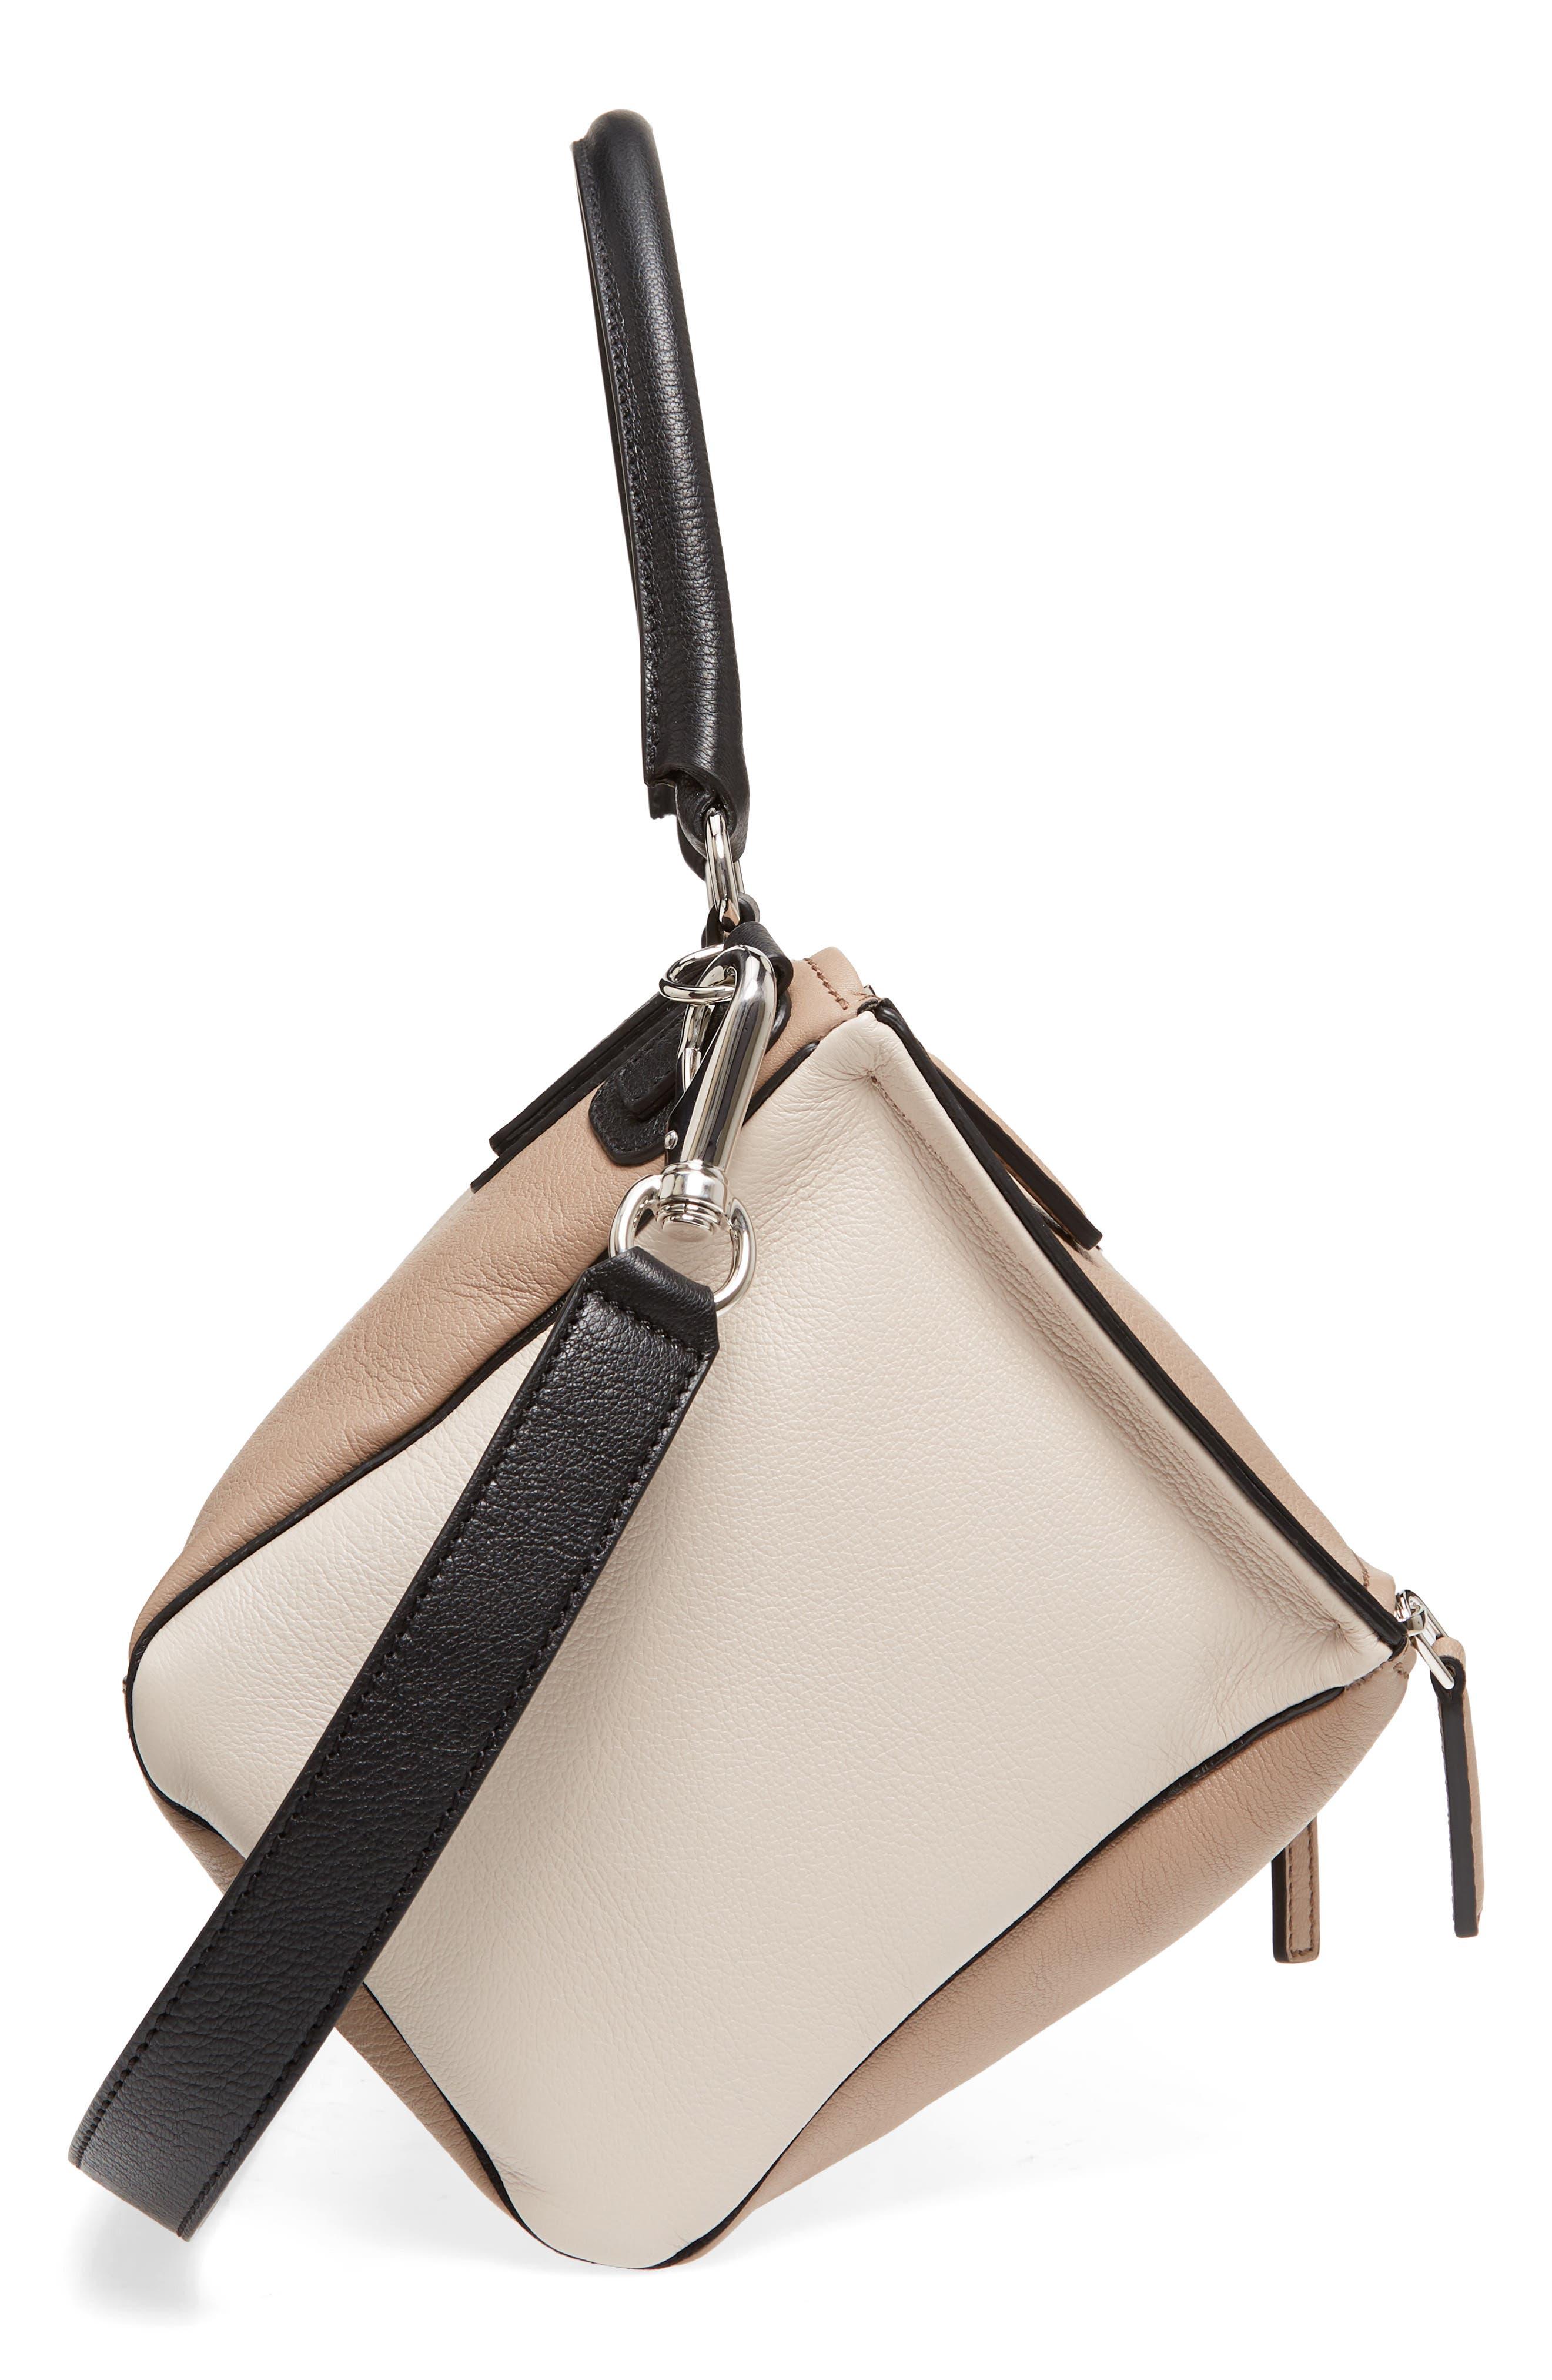 Medium Pandora Box Tricolor Leather Crossbody Bag,                             Alternate thumbnail 5, color,                             250